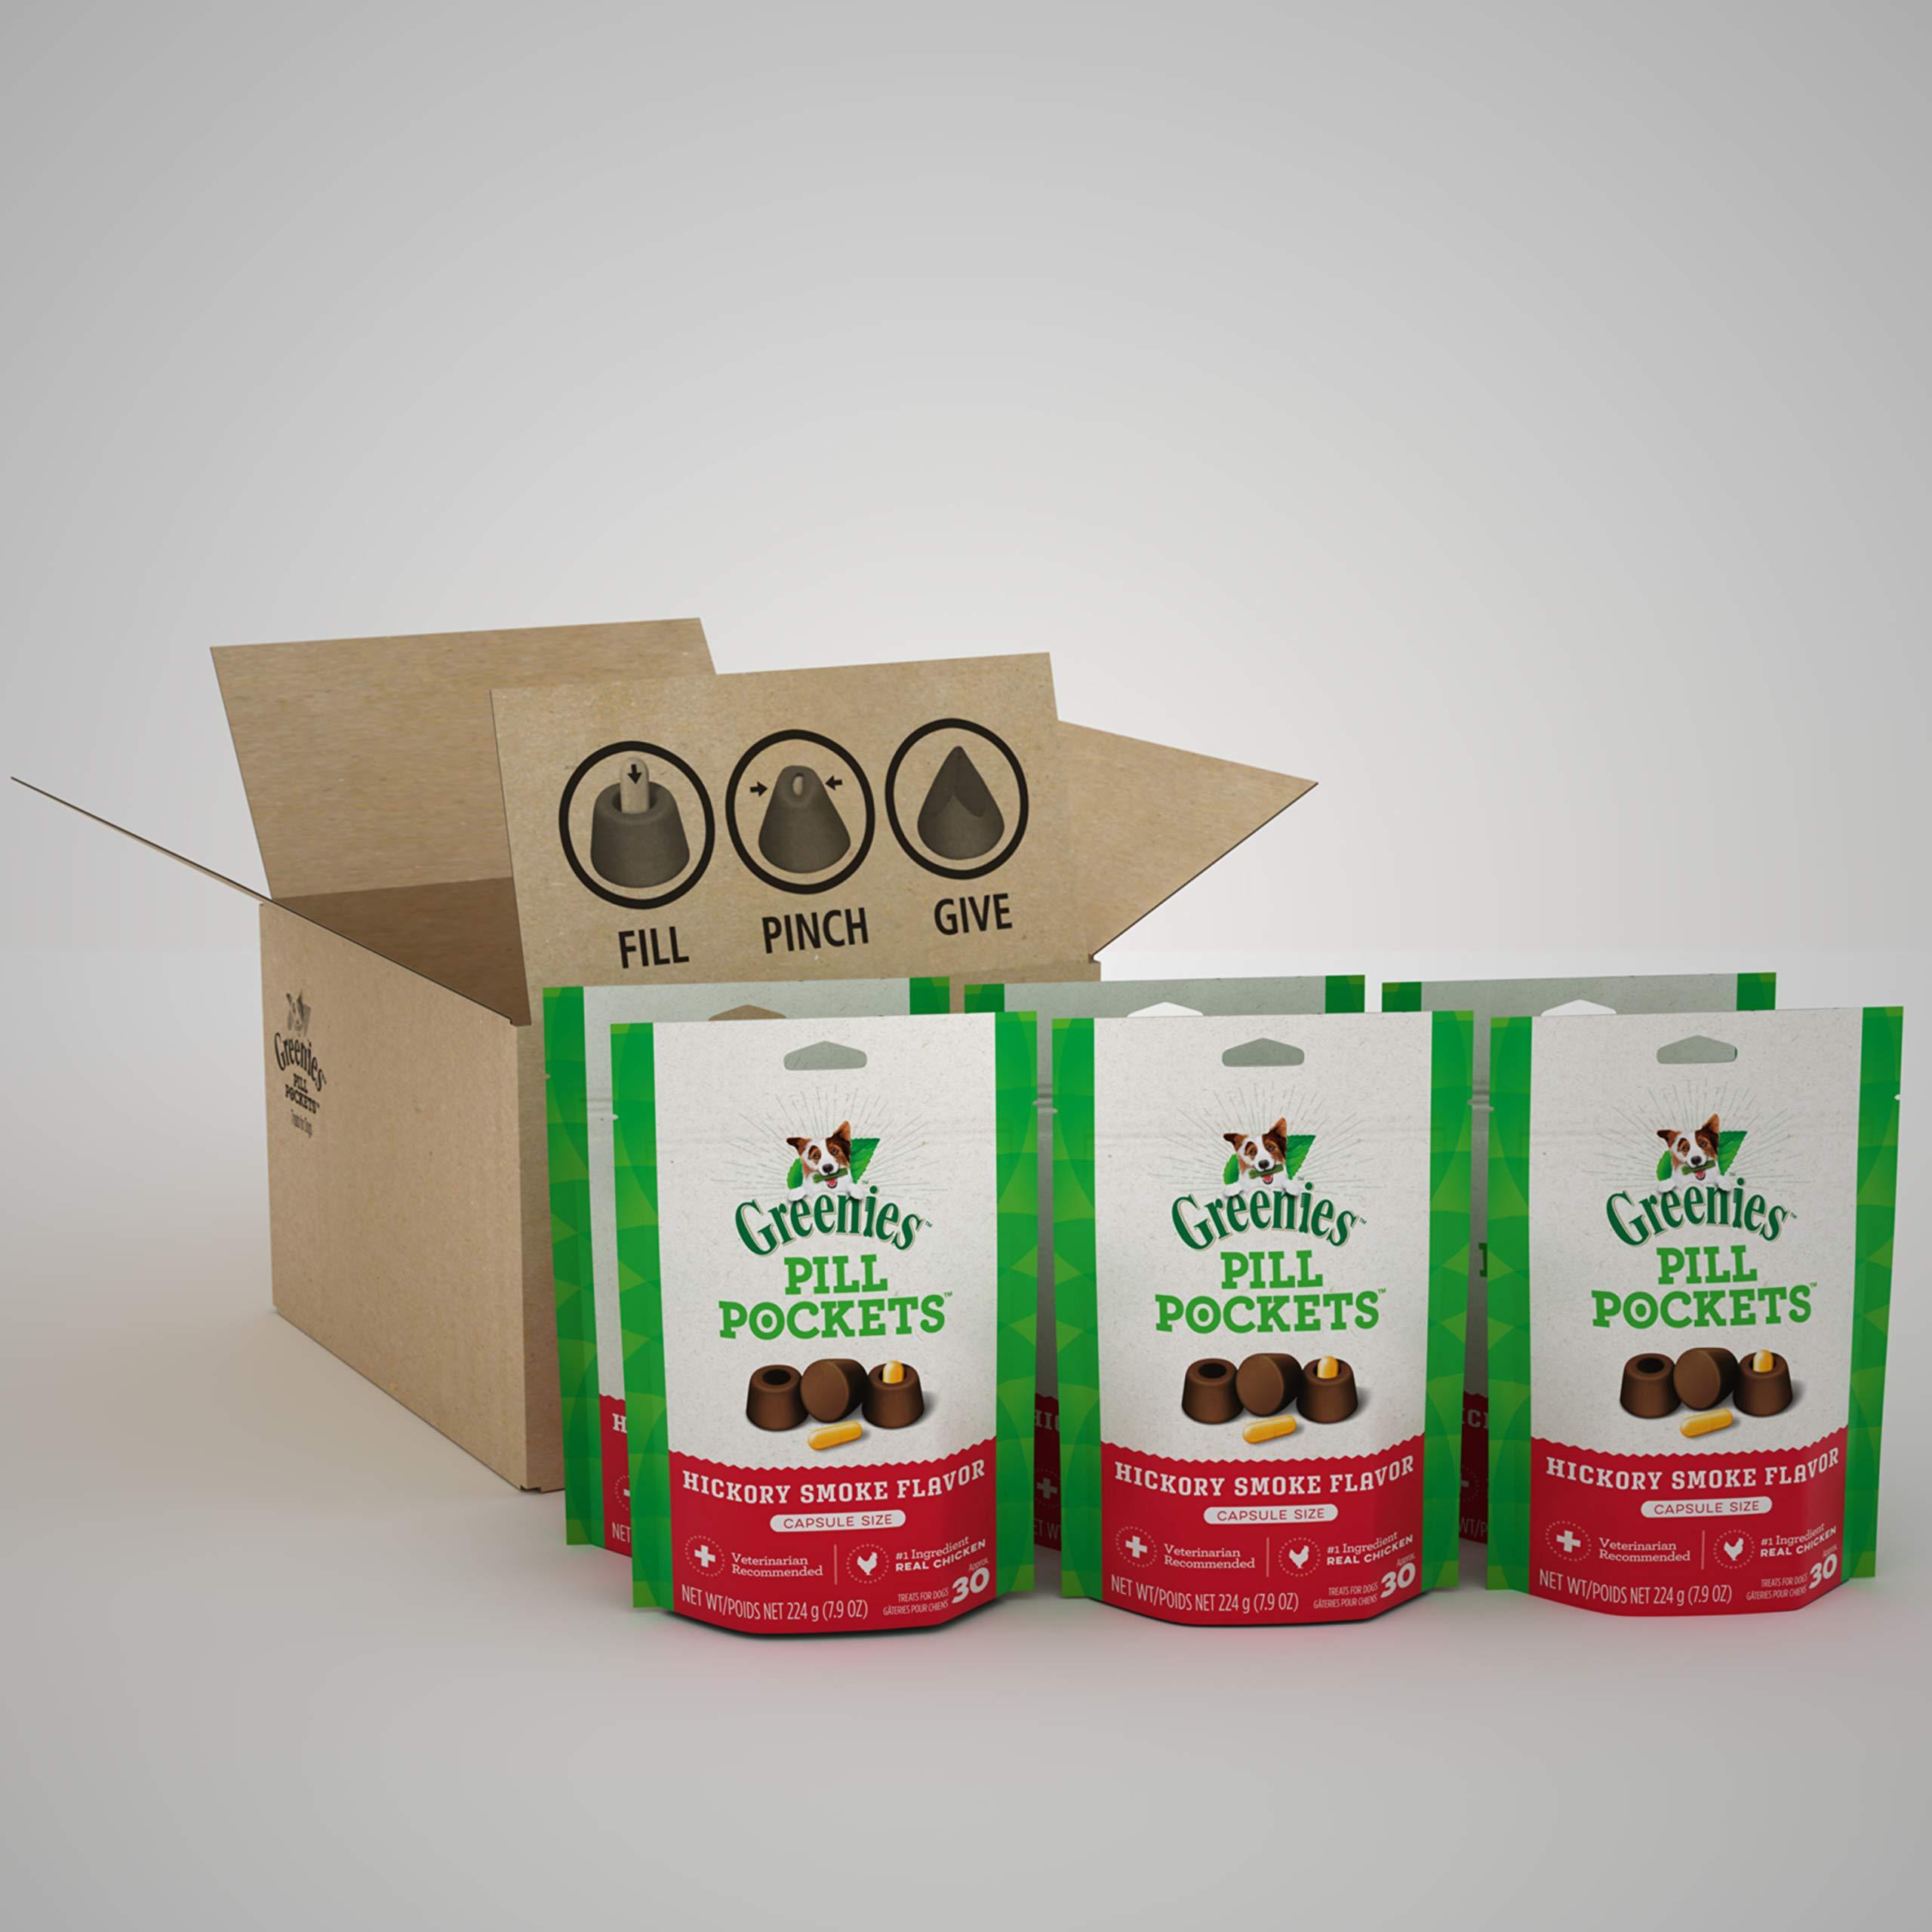 GREENIES PILL POCKETS Capsule Size Natural Dog Treats with Hickory Smoke Flavor, (6) 7.9 oz. Packs (180 Treats)